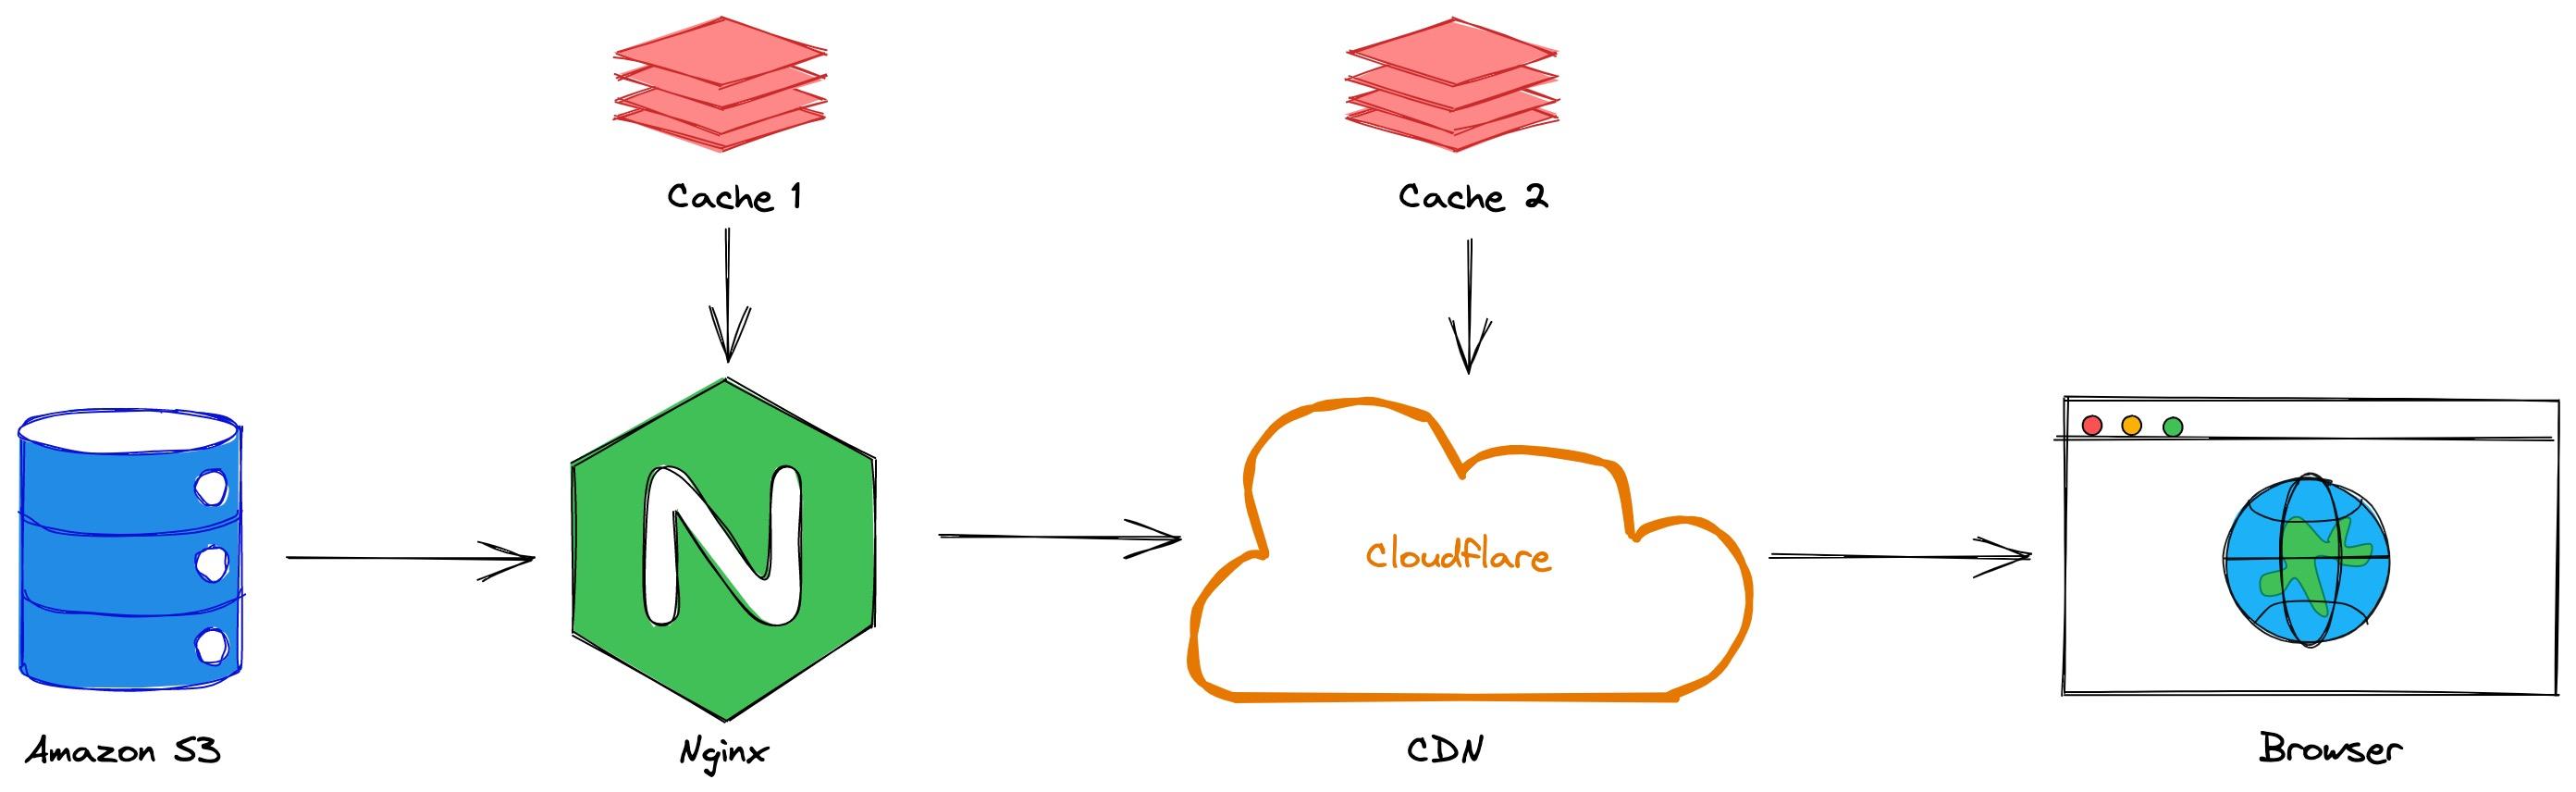 s3-nginx-cloudflare